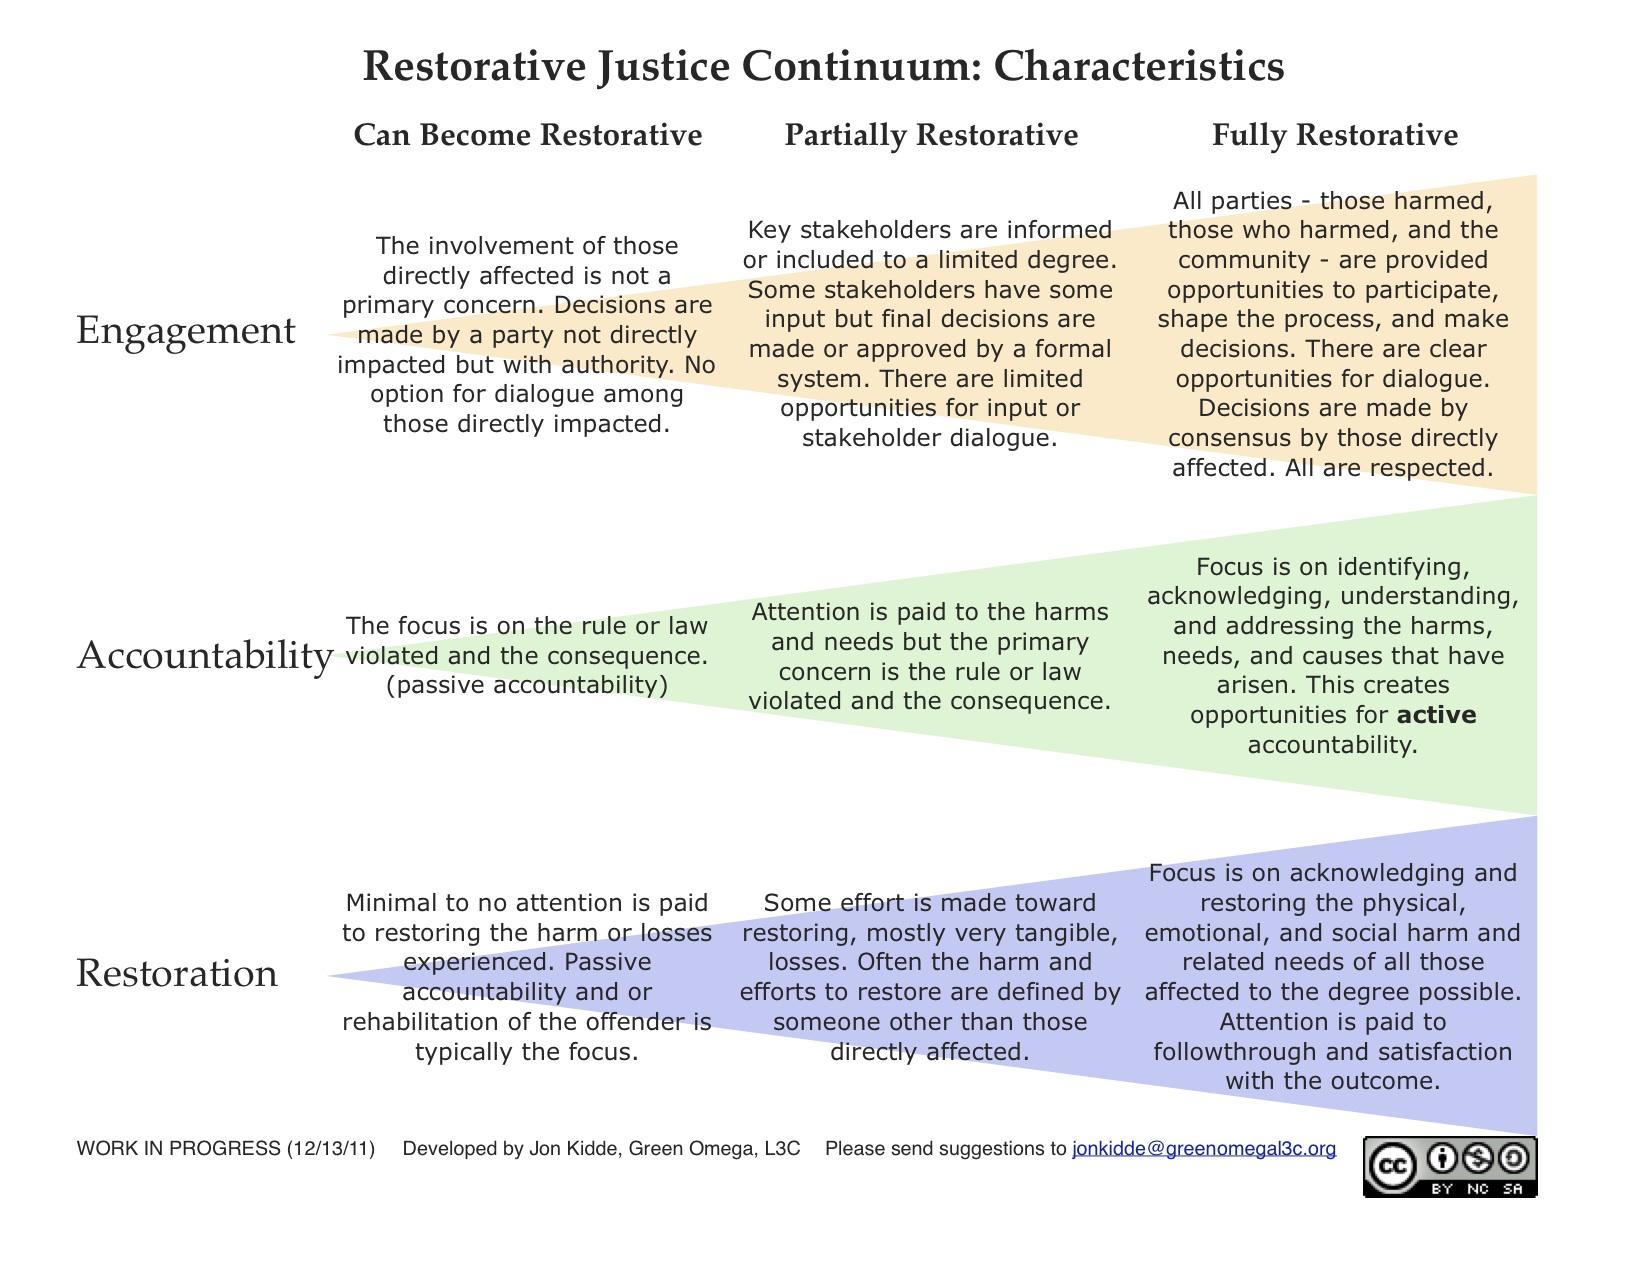 Rj Continuum By Jon Kidde Restorative Justice Blog